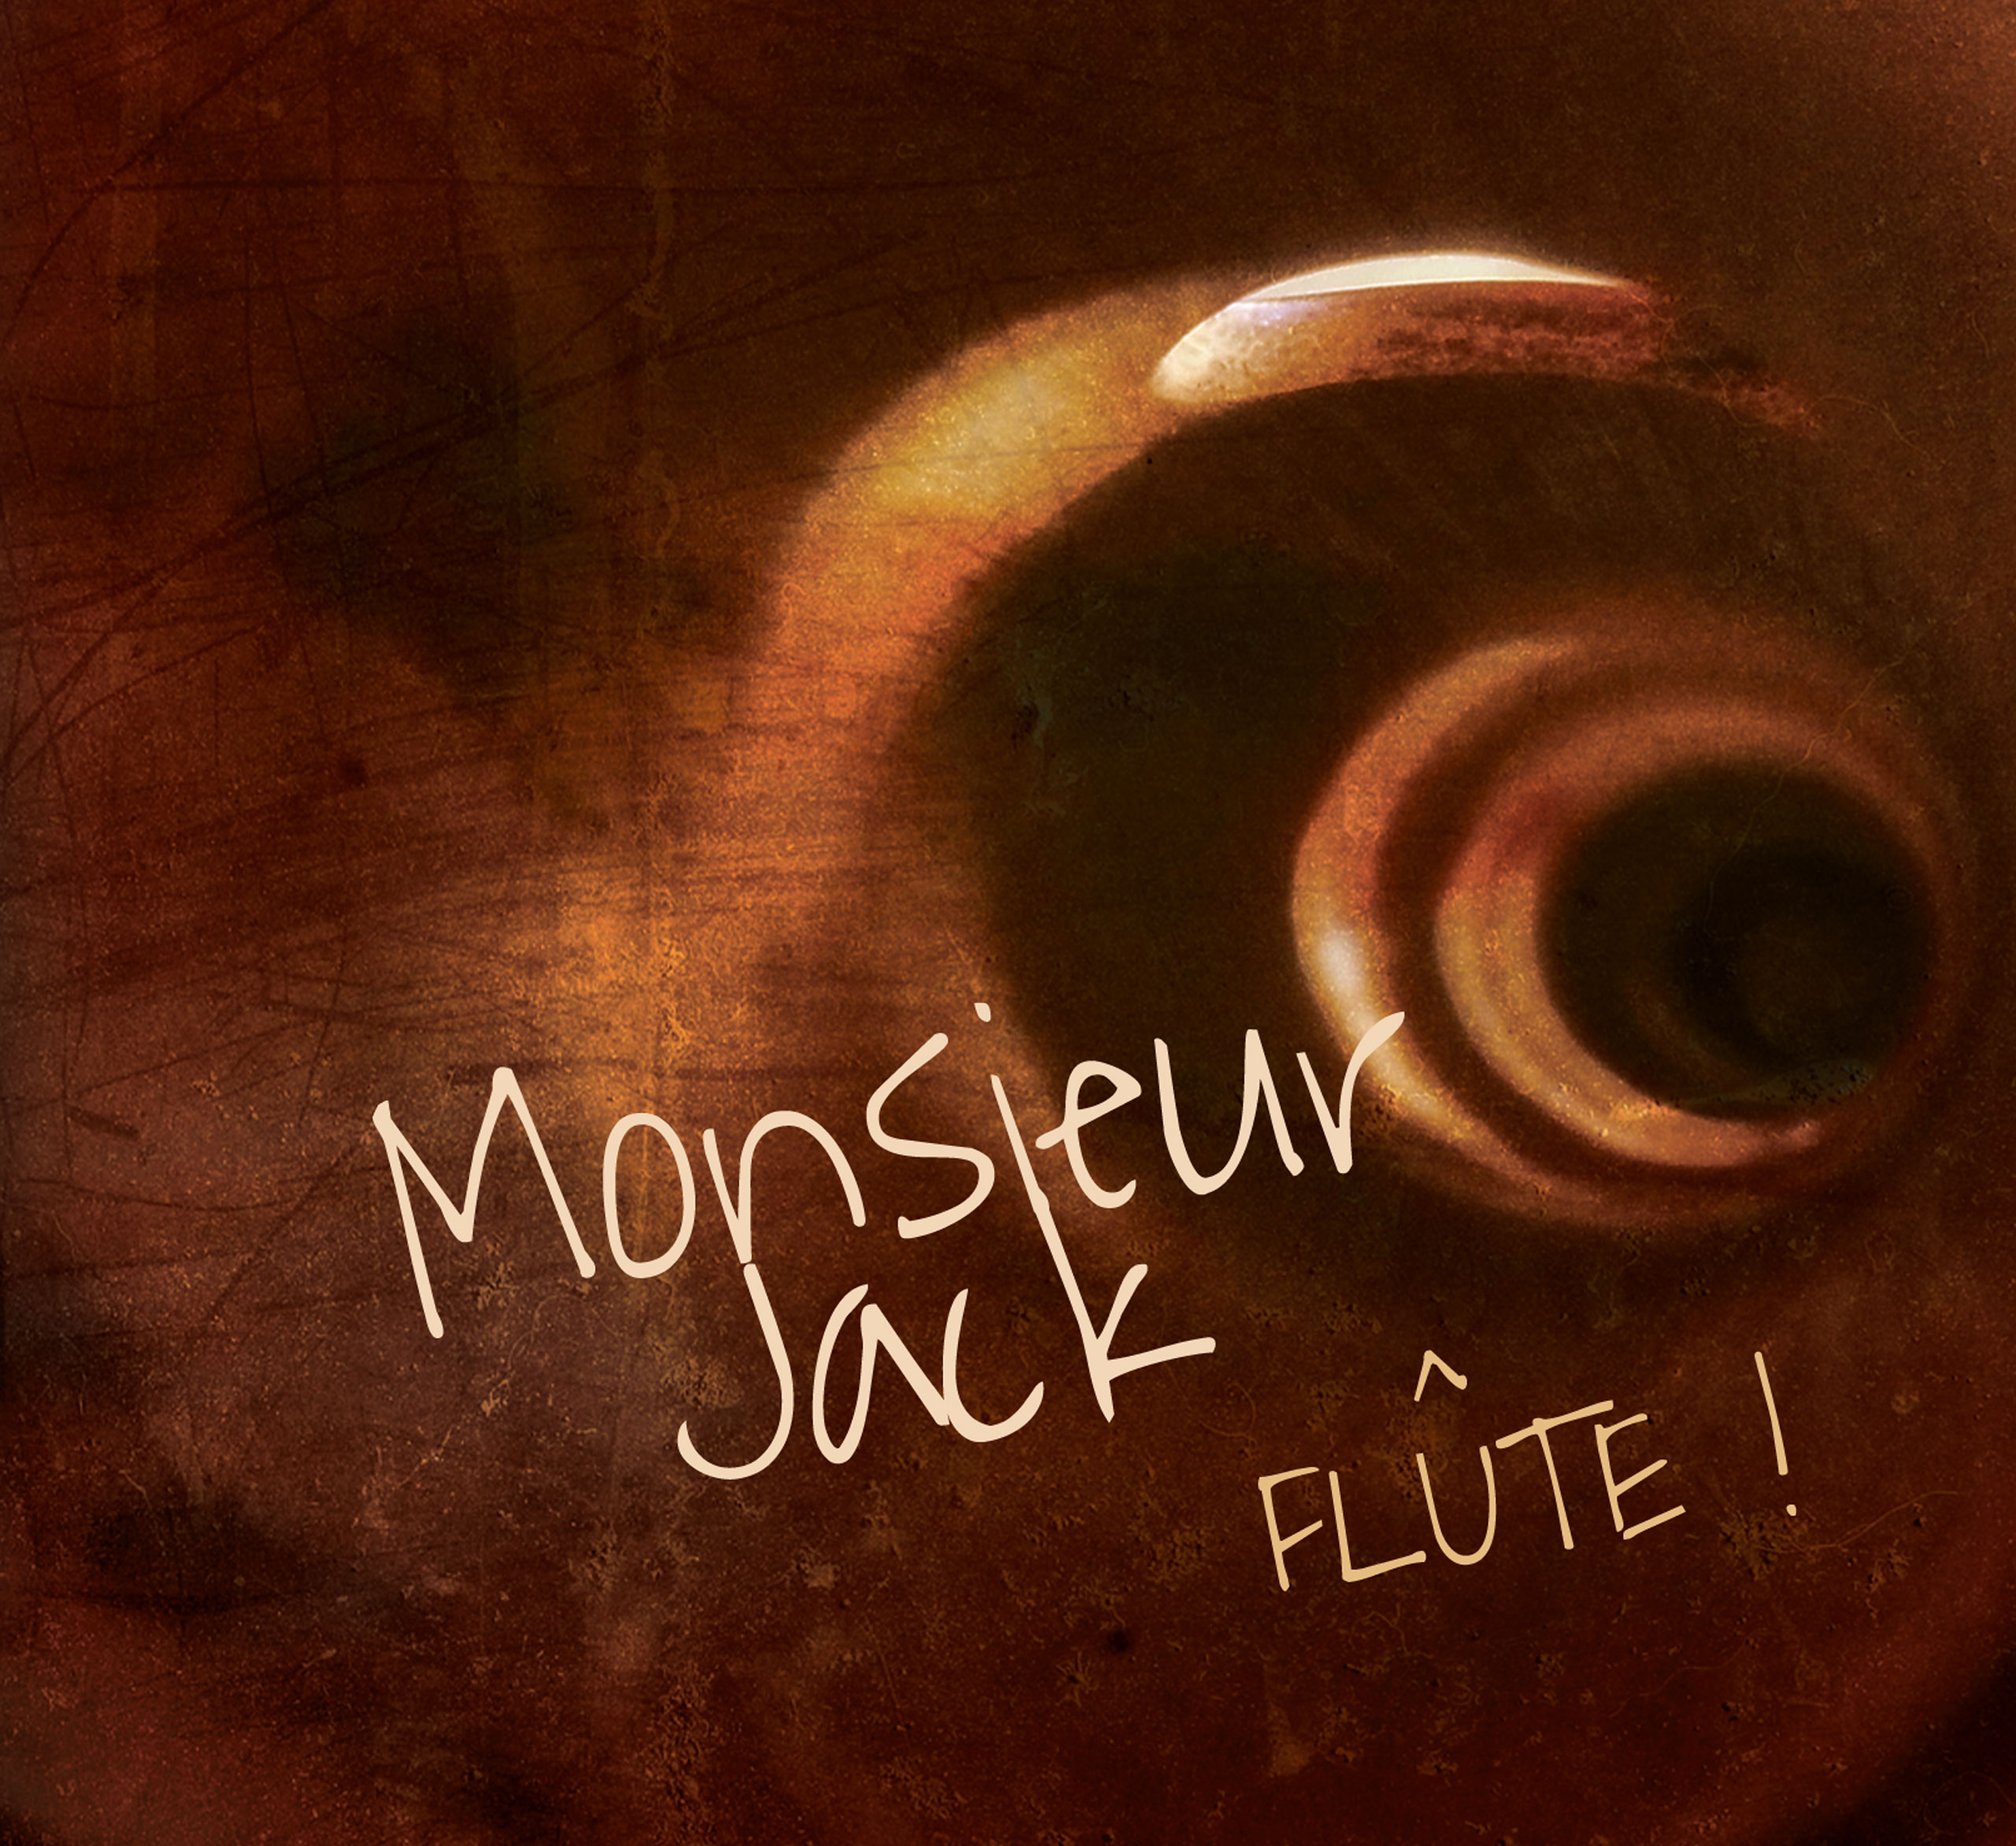 monsieurjack-pochettehd